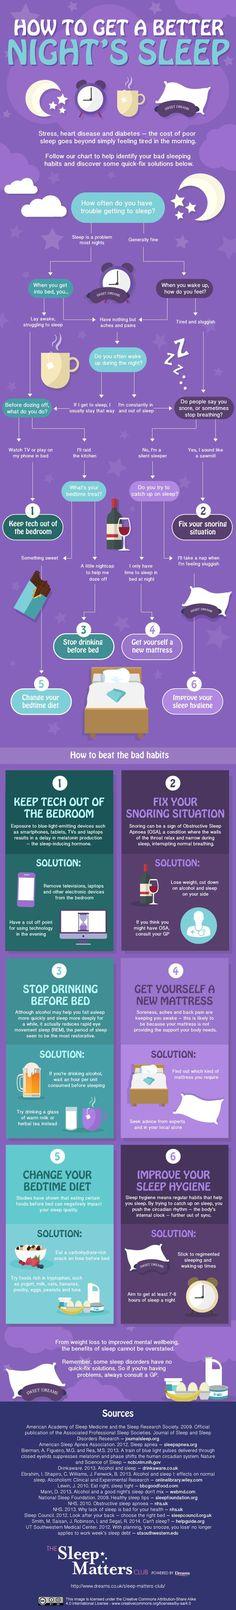 A Helpful Infographic To Make You Have Better Sleep get better sleep, sleeping tips